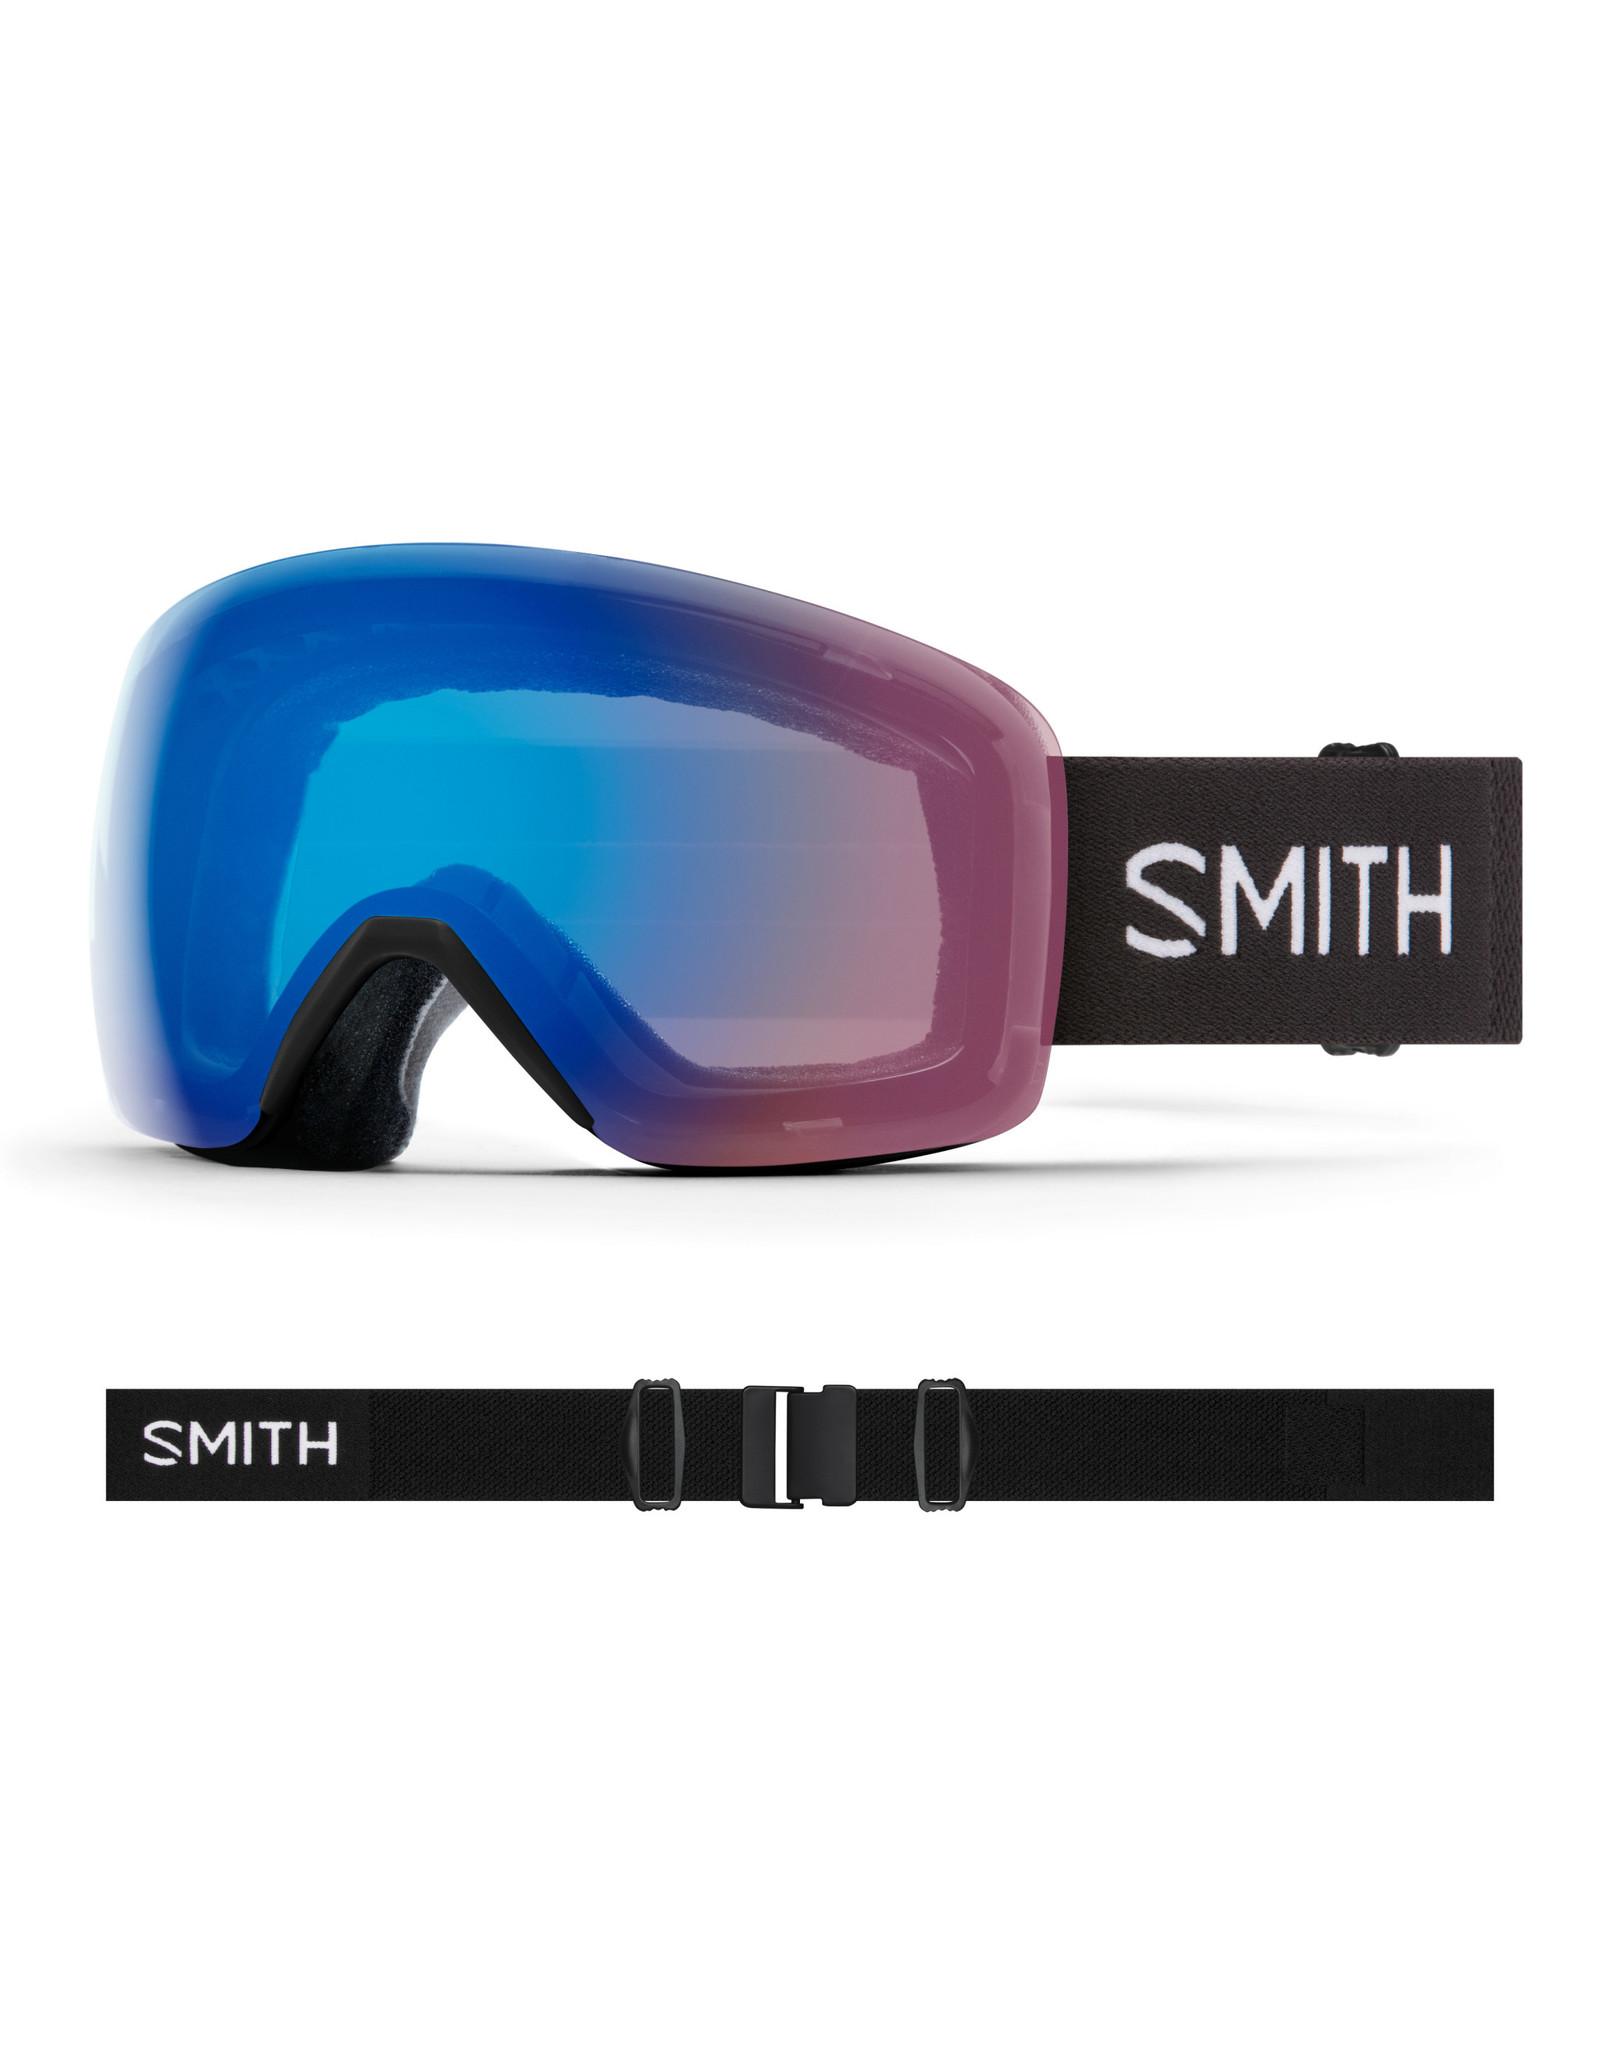 Smith SMITH SKYLINE BLACK 20 SKI GOGGLE